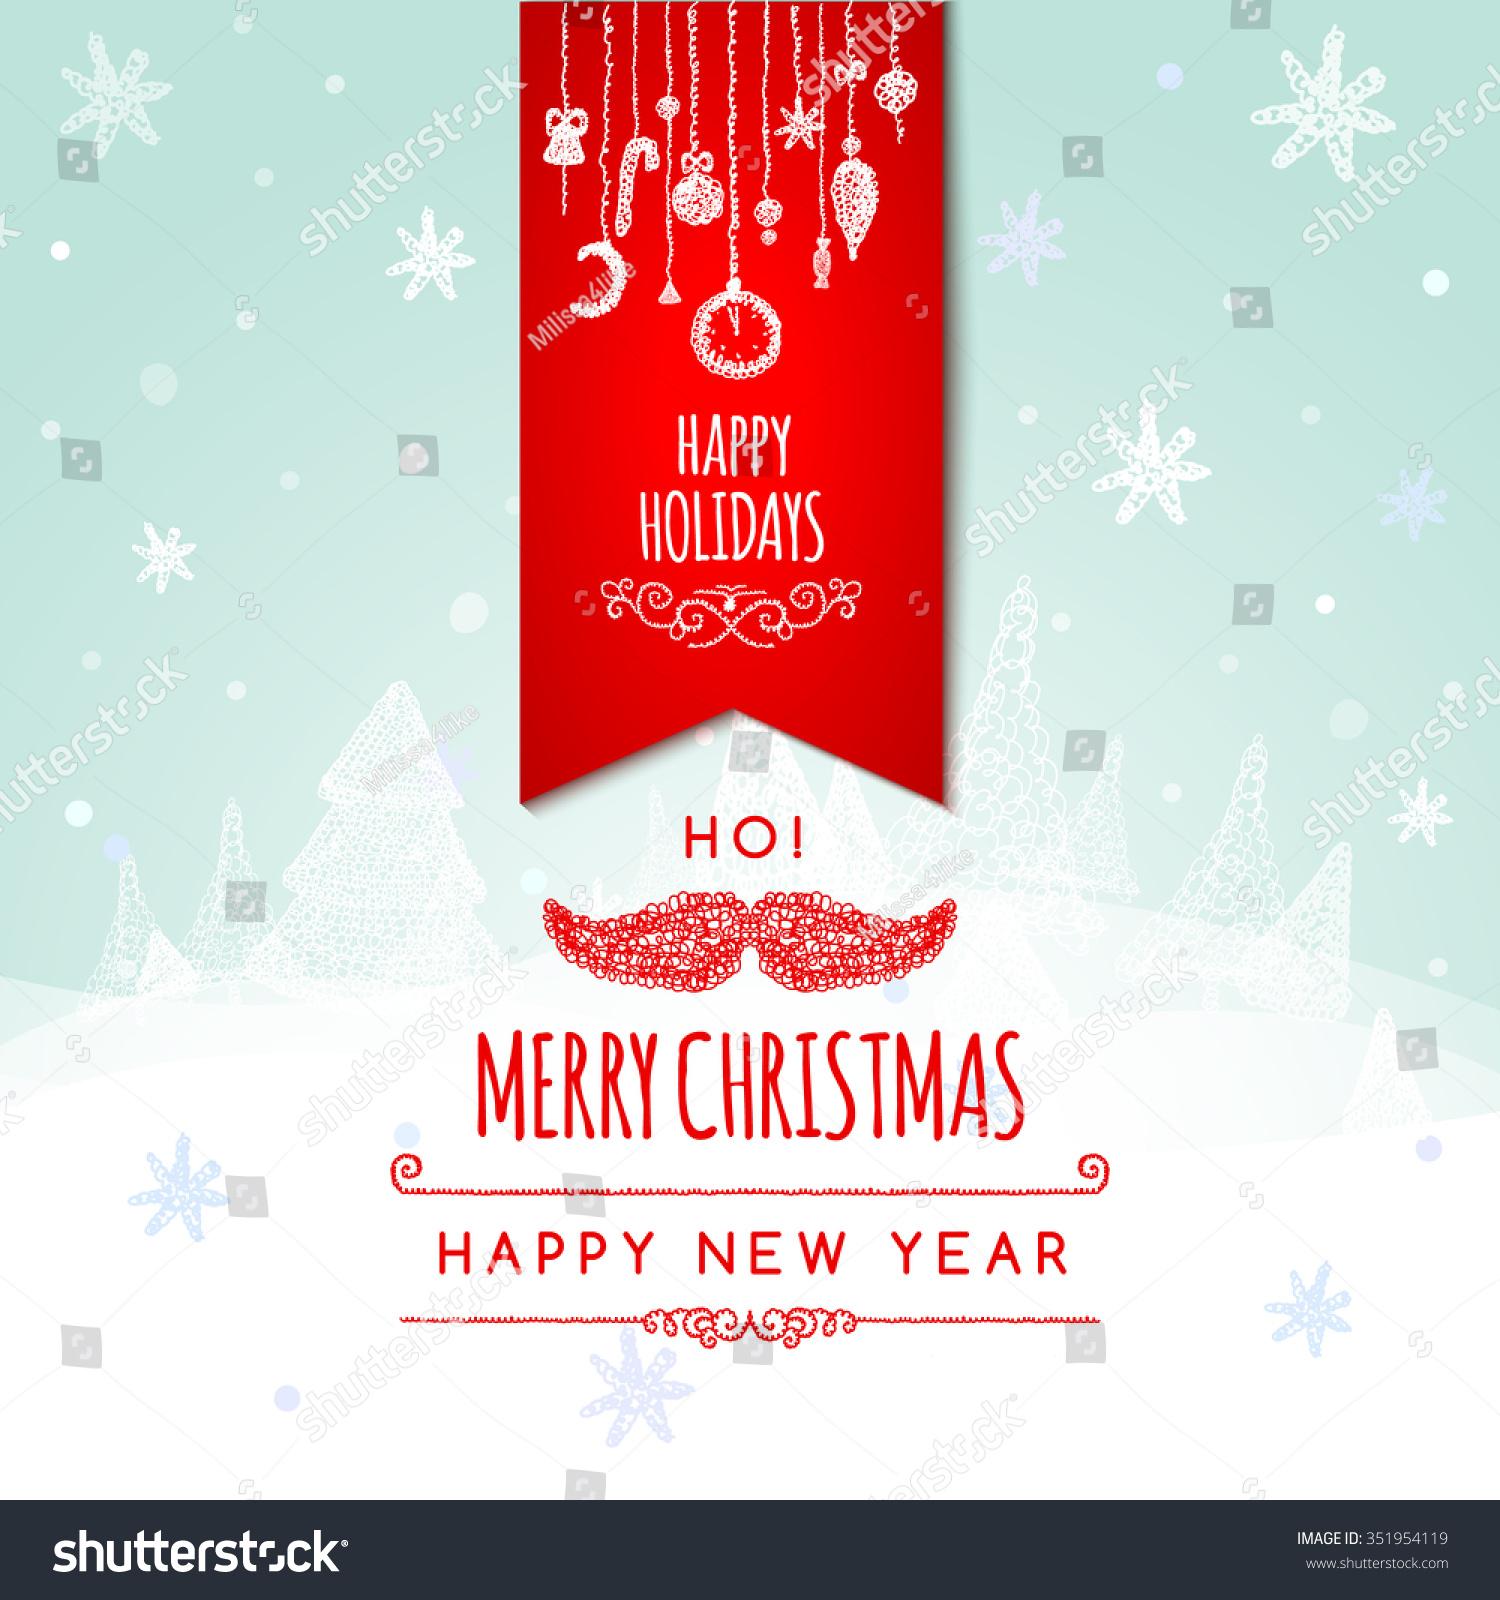 Merry christmas holiday greeting design santa stock illustration merry christmas holiday greeting design with santa claus mustache and christmas tree background illustration kristyandbryce Gallery